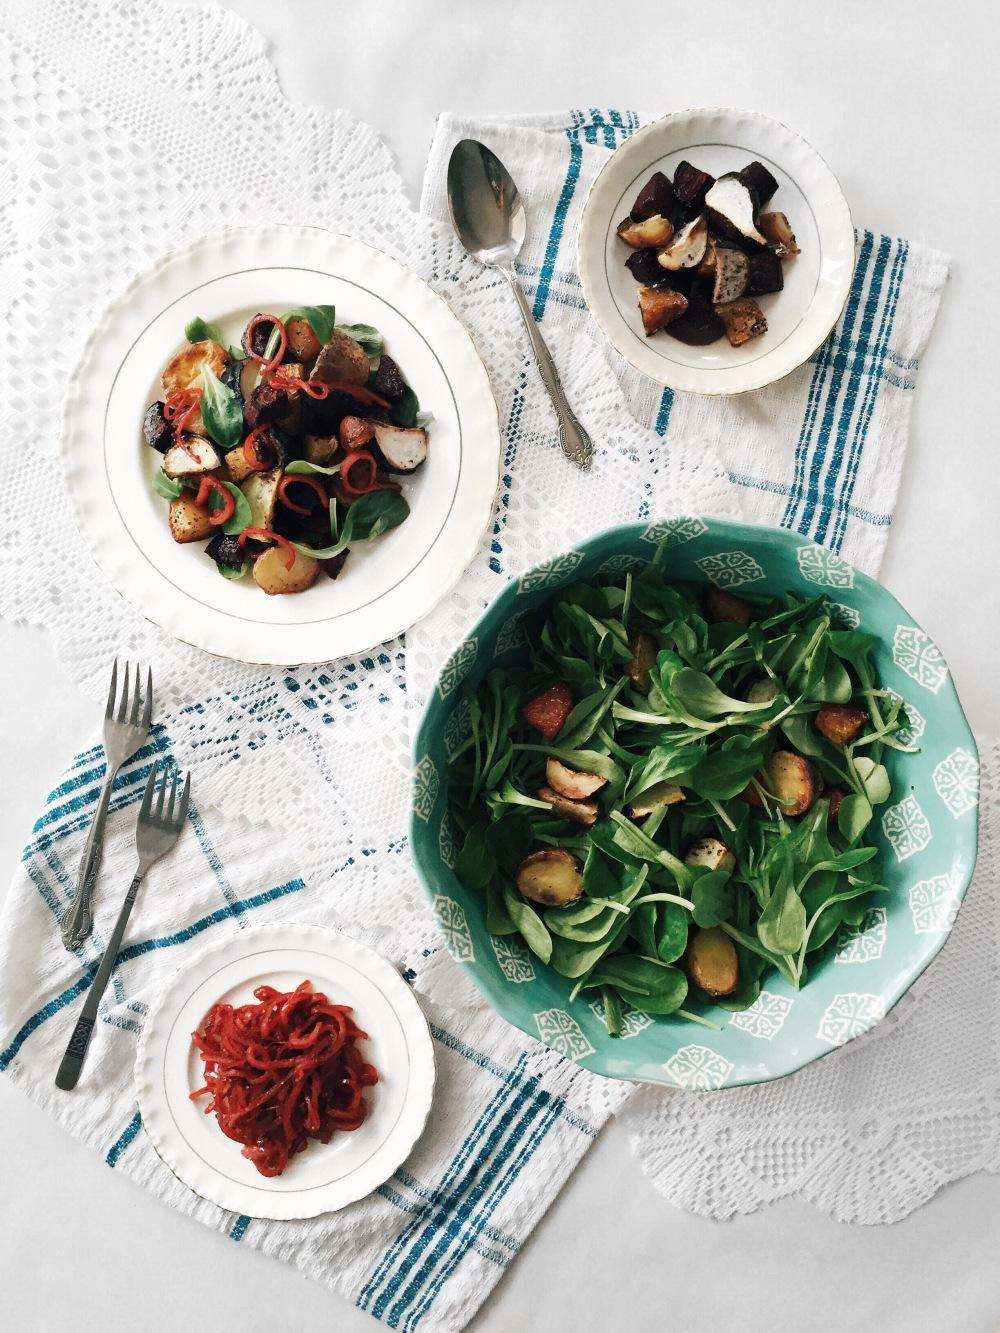 salade-patate-betterave-radis-oignons-marines